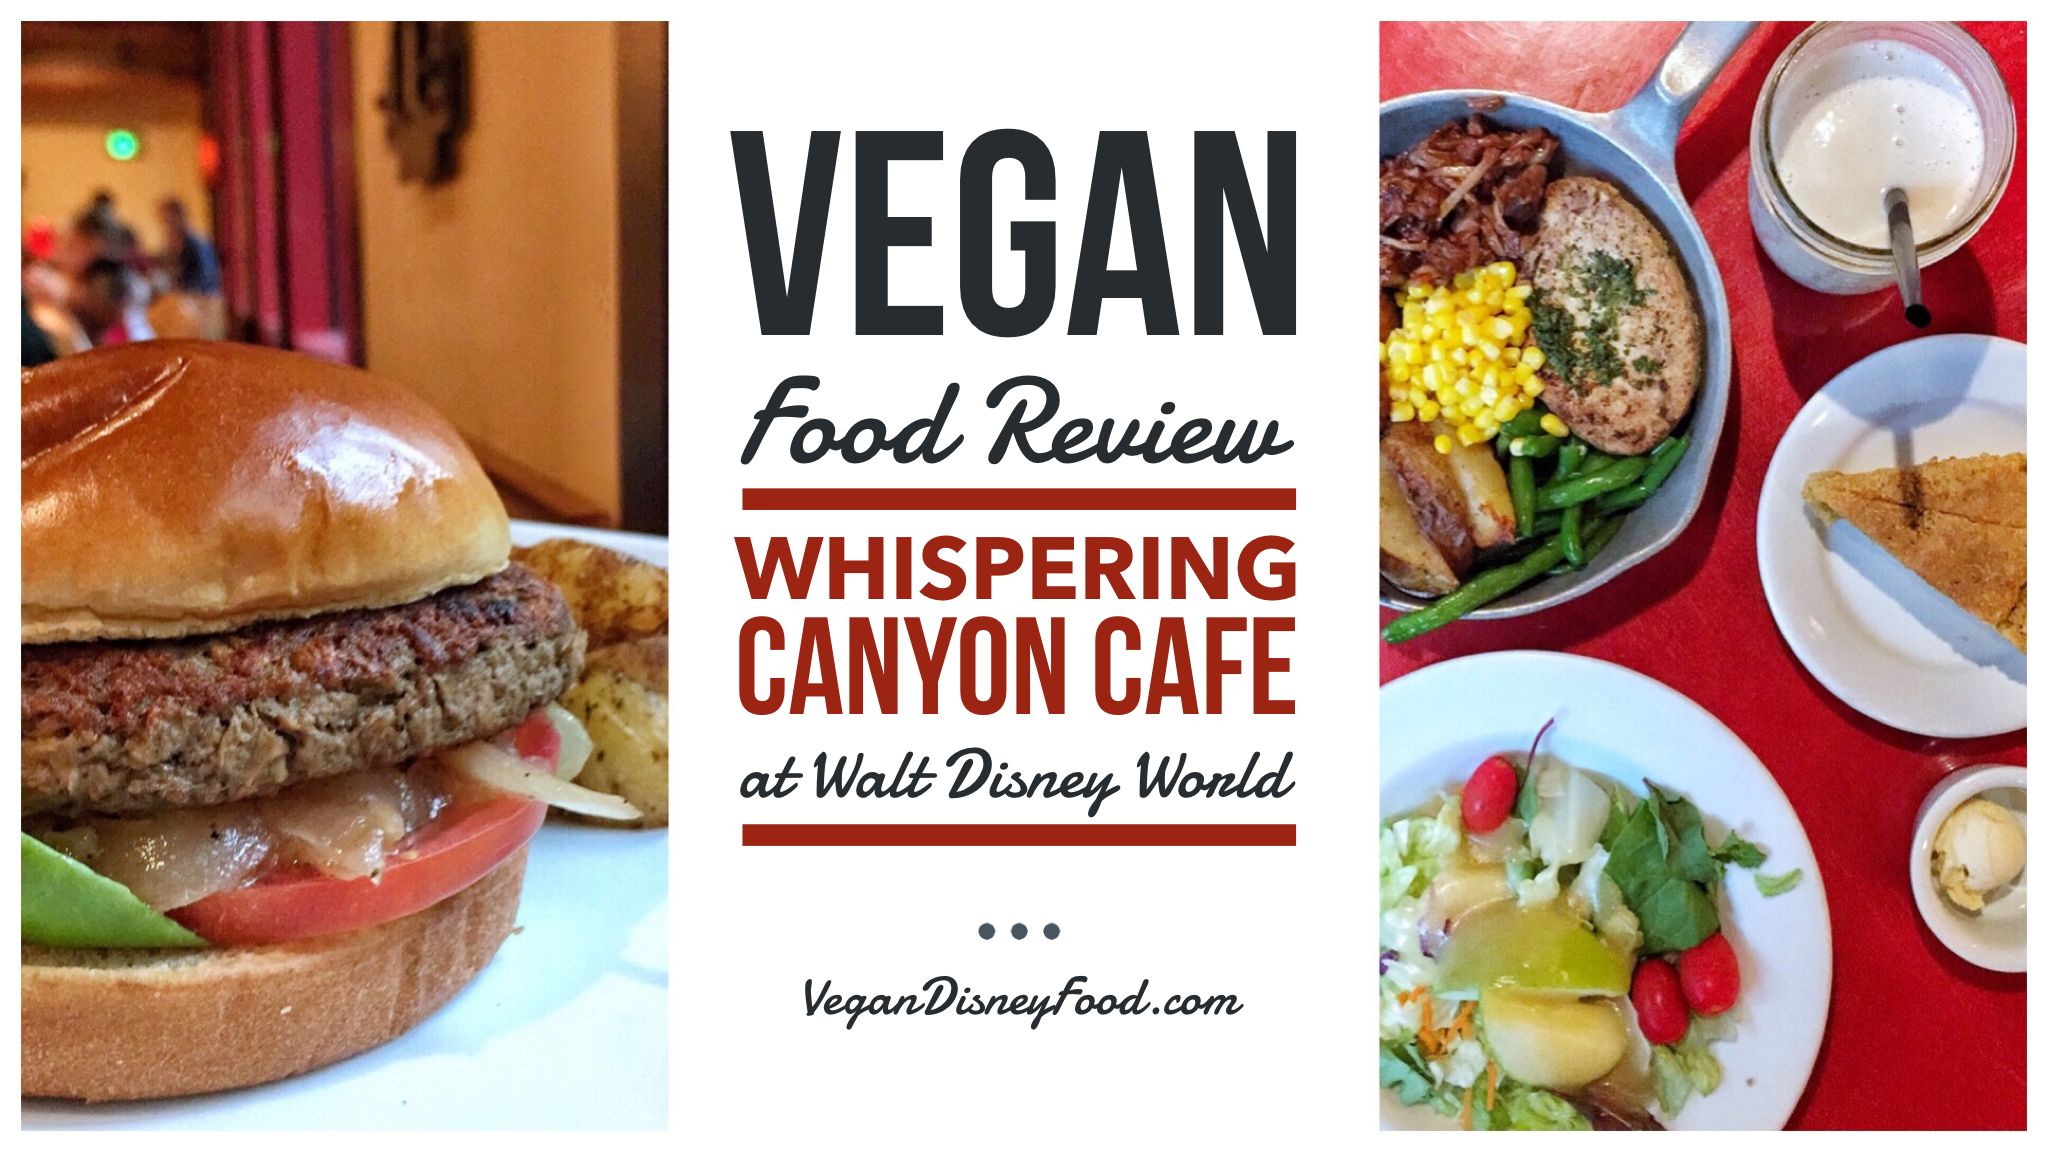 Vegan Food Review: Whispering Canyon Cafe at Walt Disney World